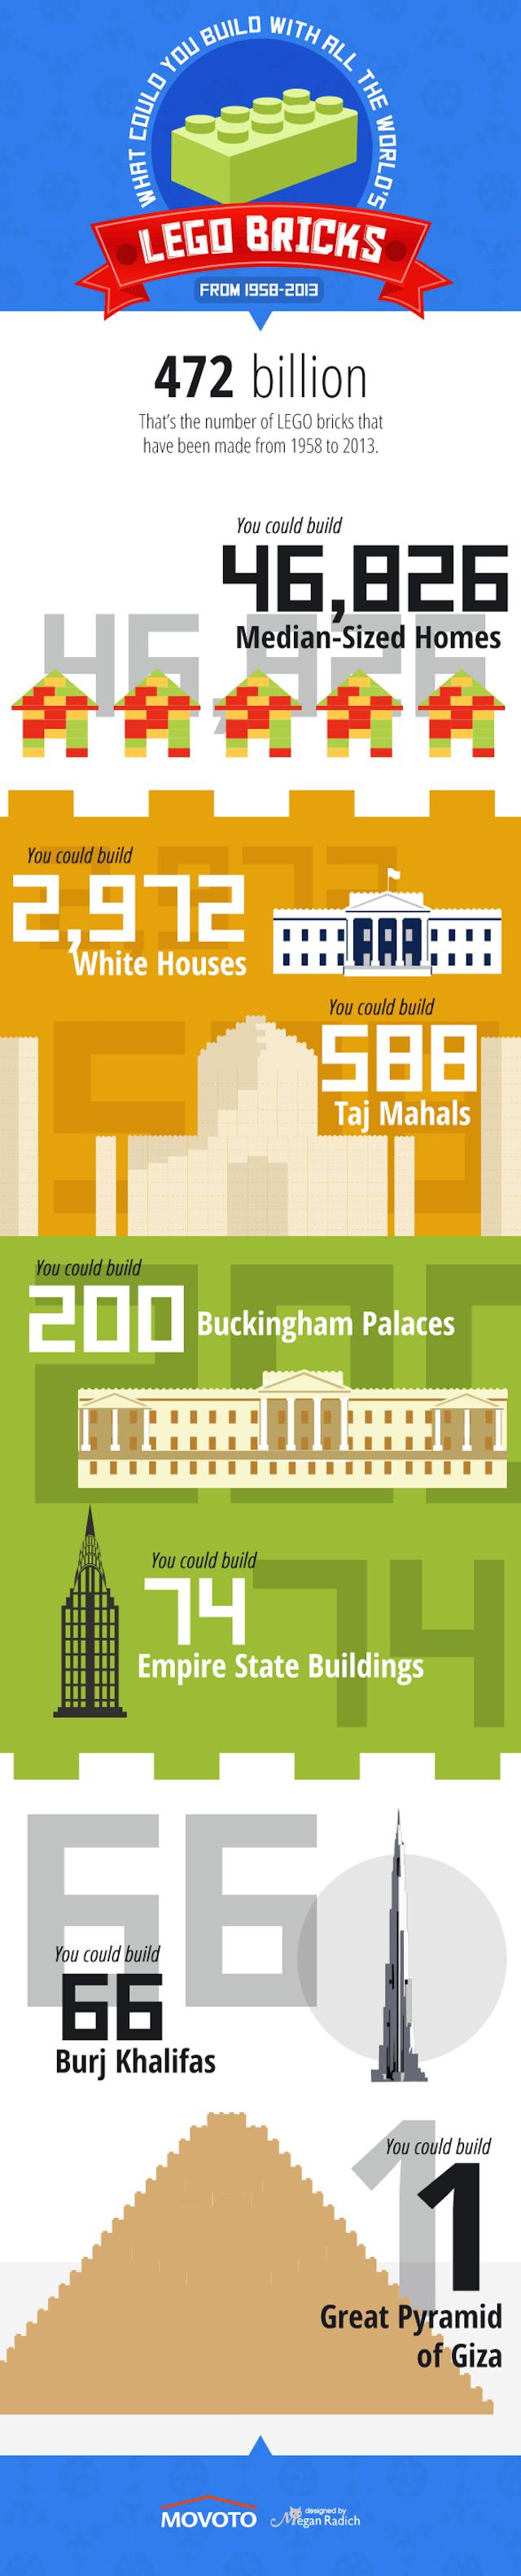 lego-bricks-infographic